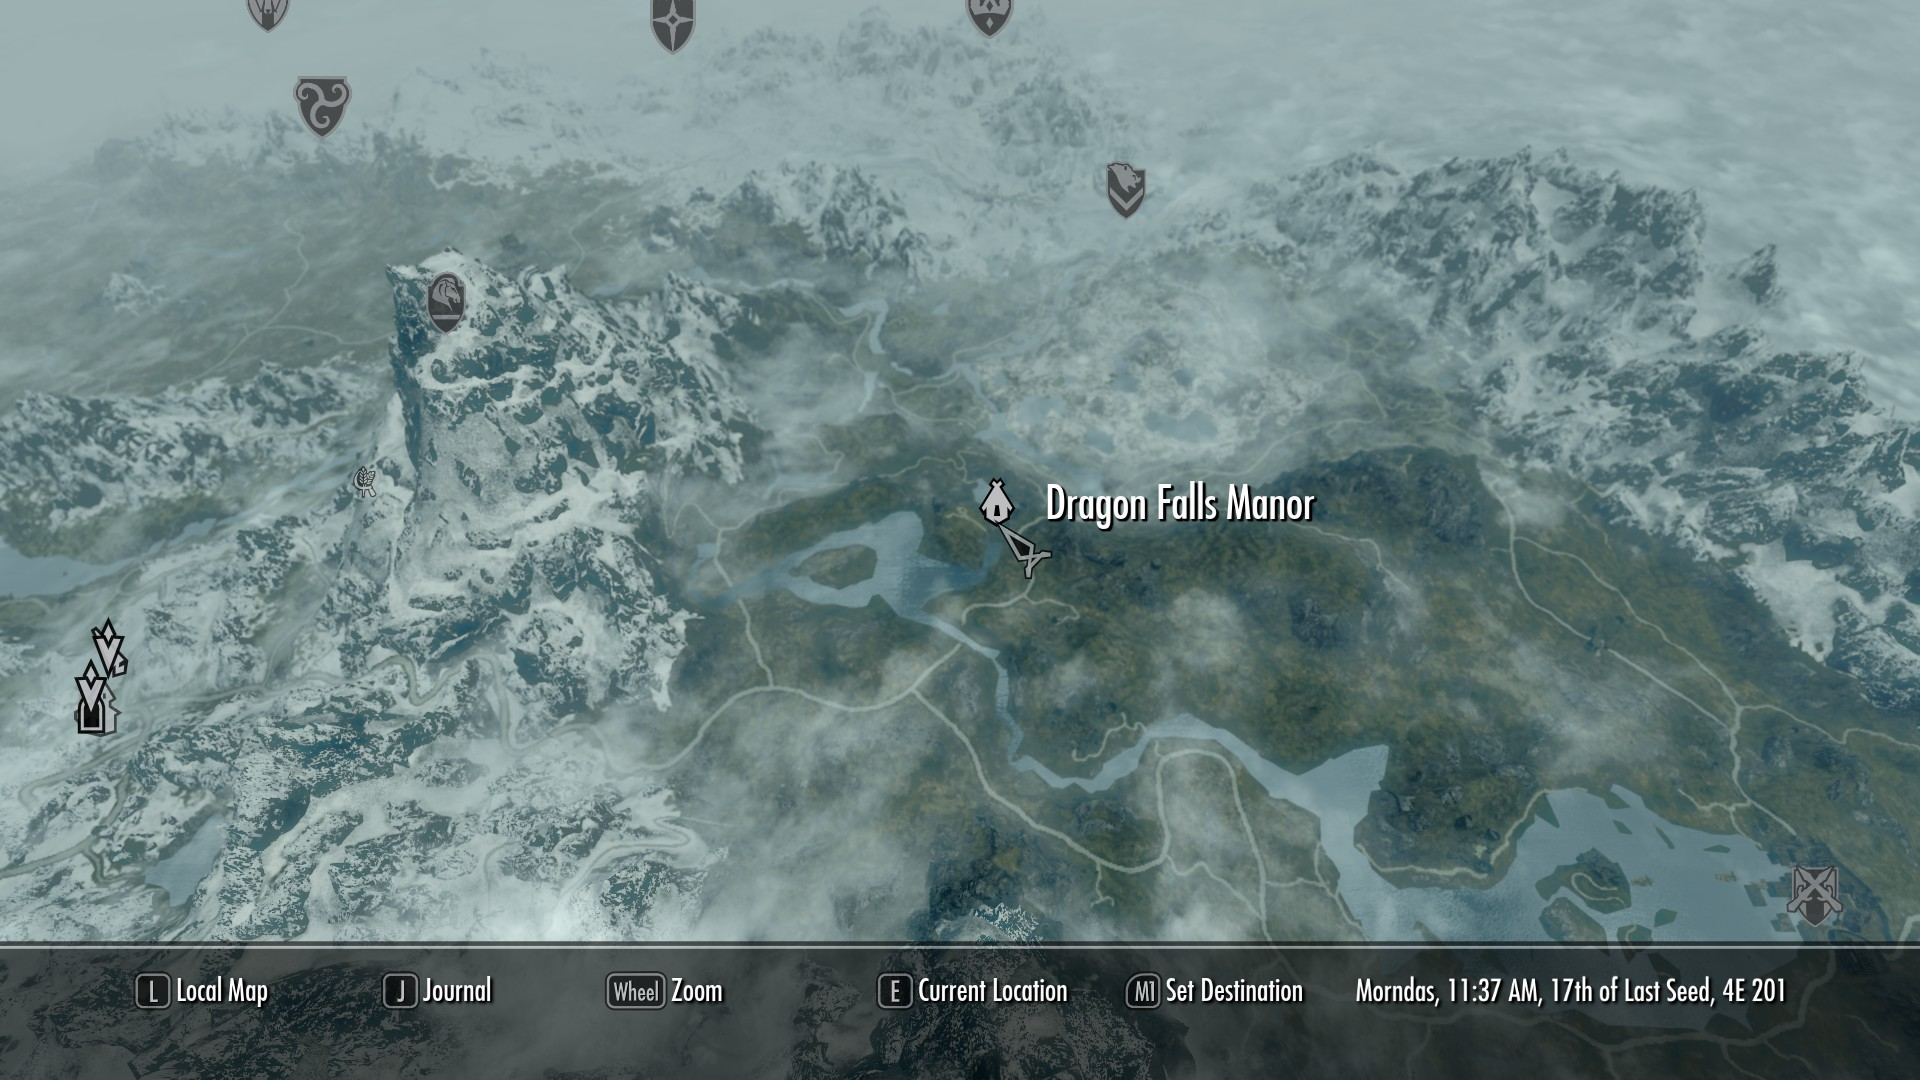 Dragon Falls Manor Elder Scrolls Skyrim Houses Images